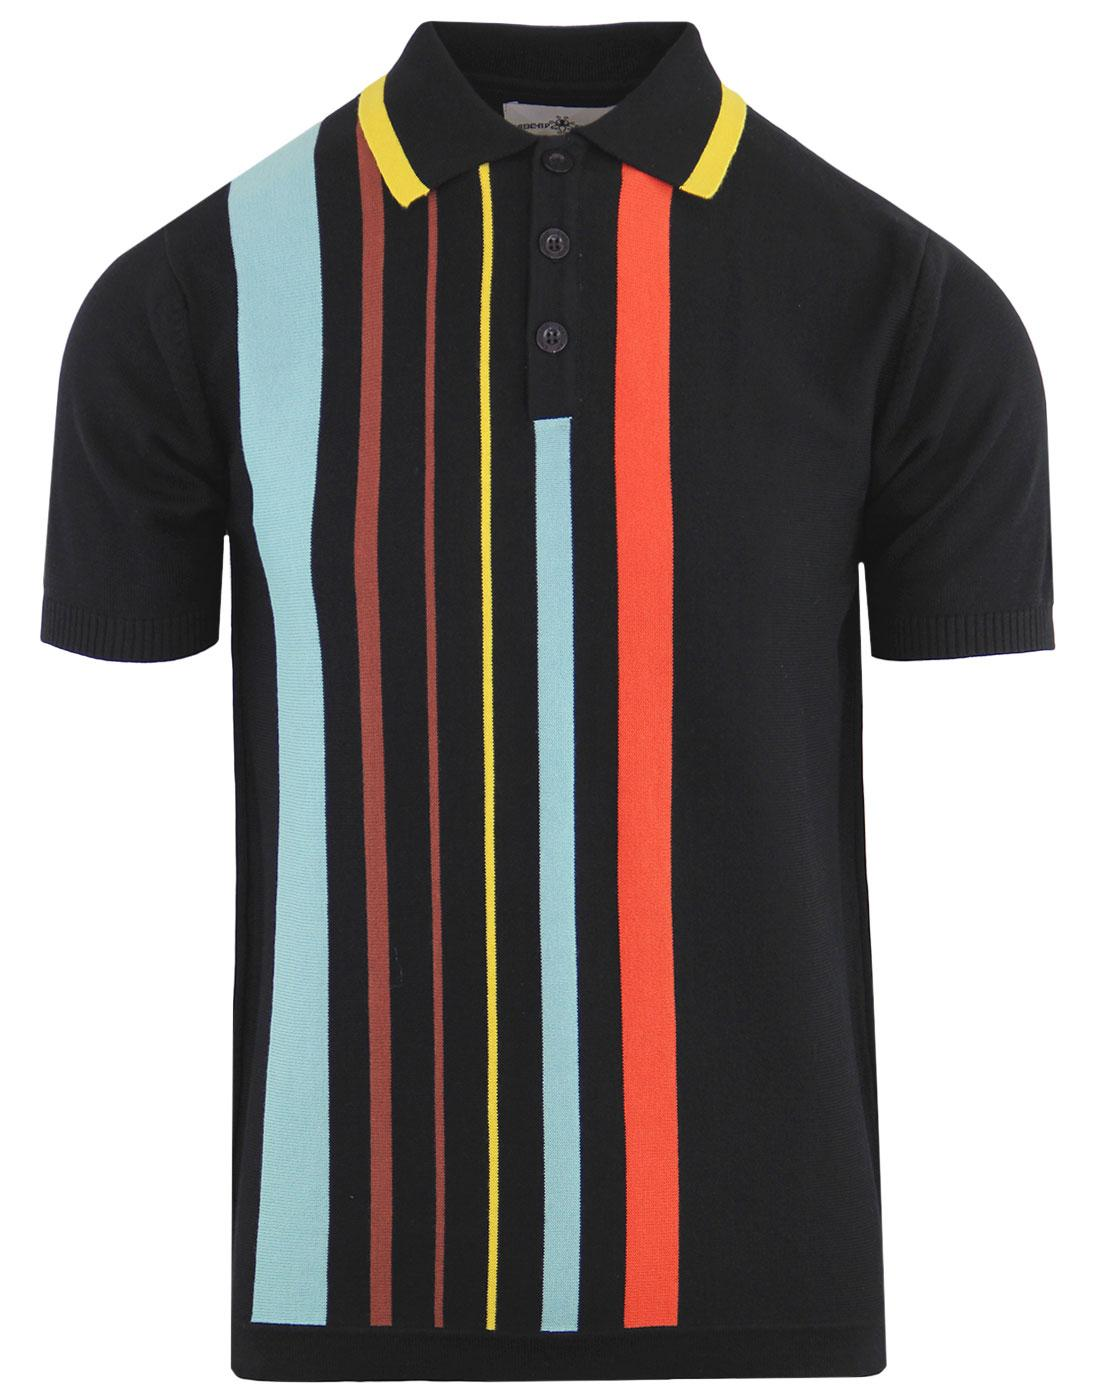 Bauhaus MADCAP ENGLAND Mod Stripe Knit Polo BLACK